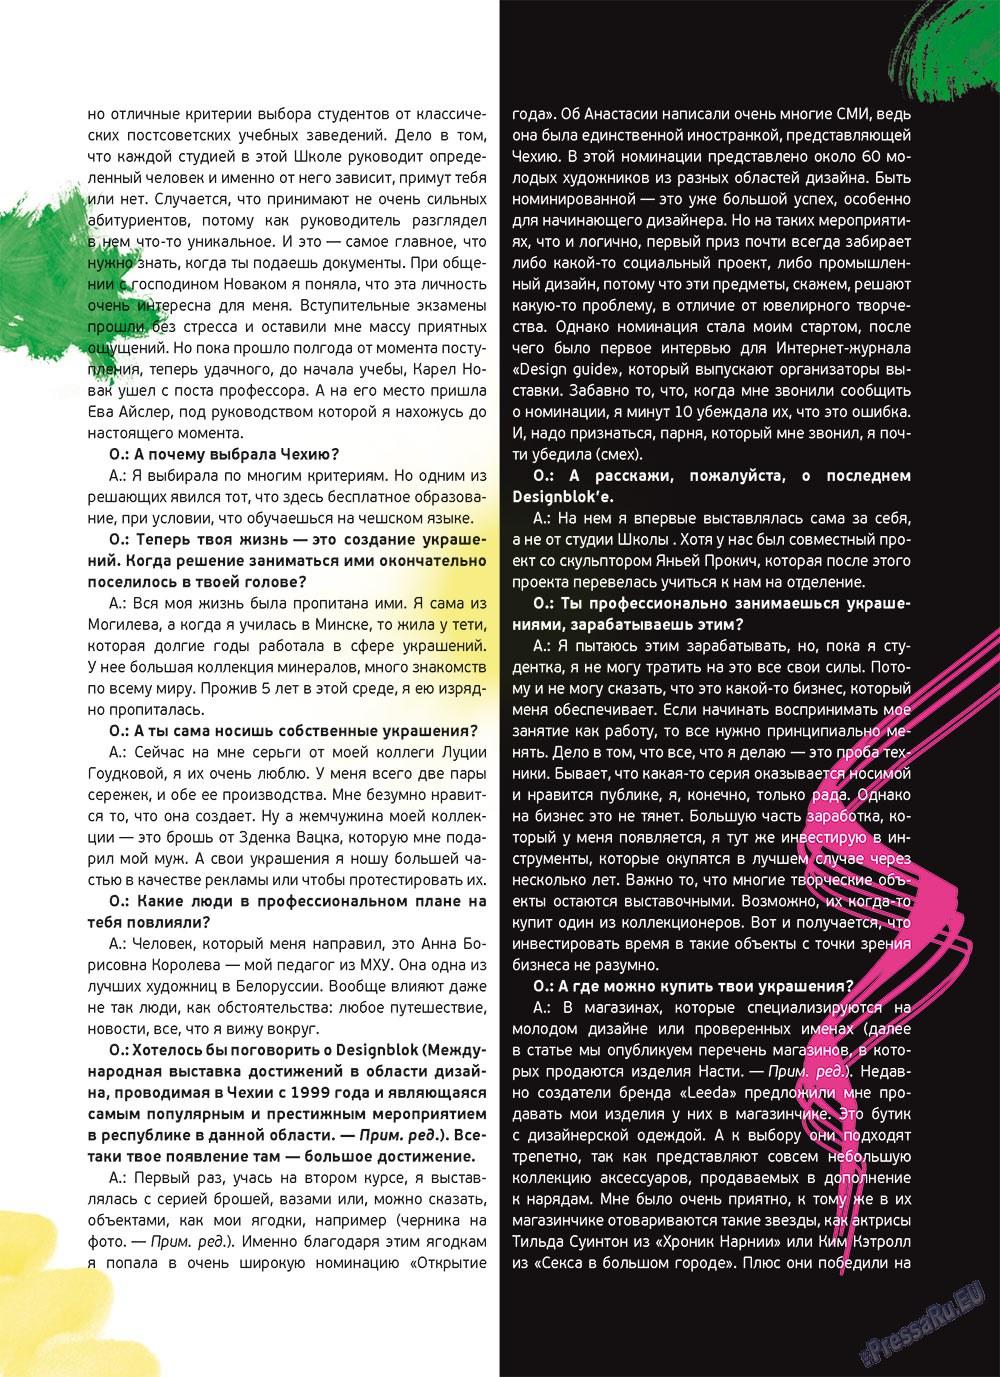 Артек (журнал). 2012 год, номер 3, стр. 7